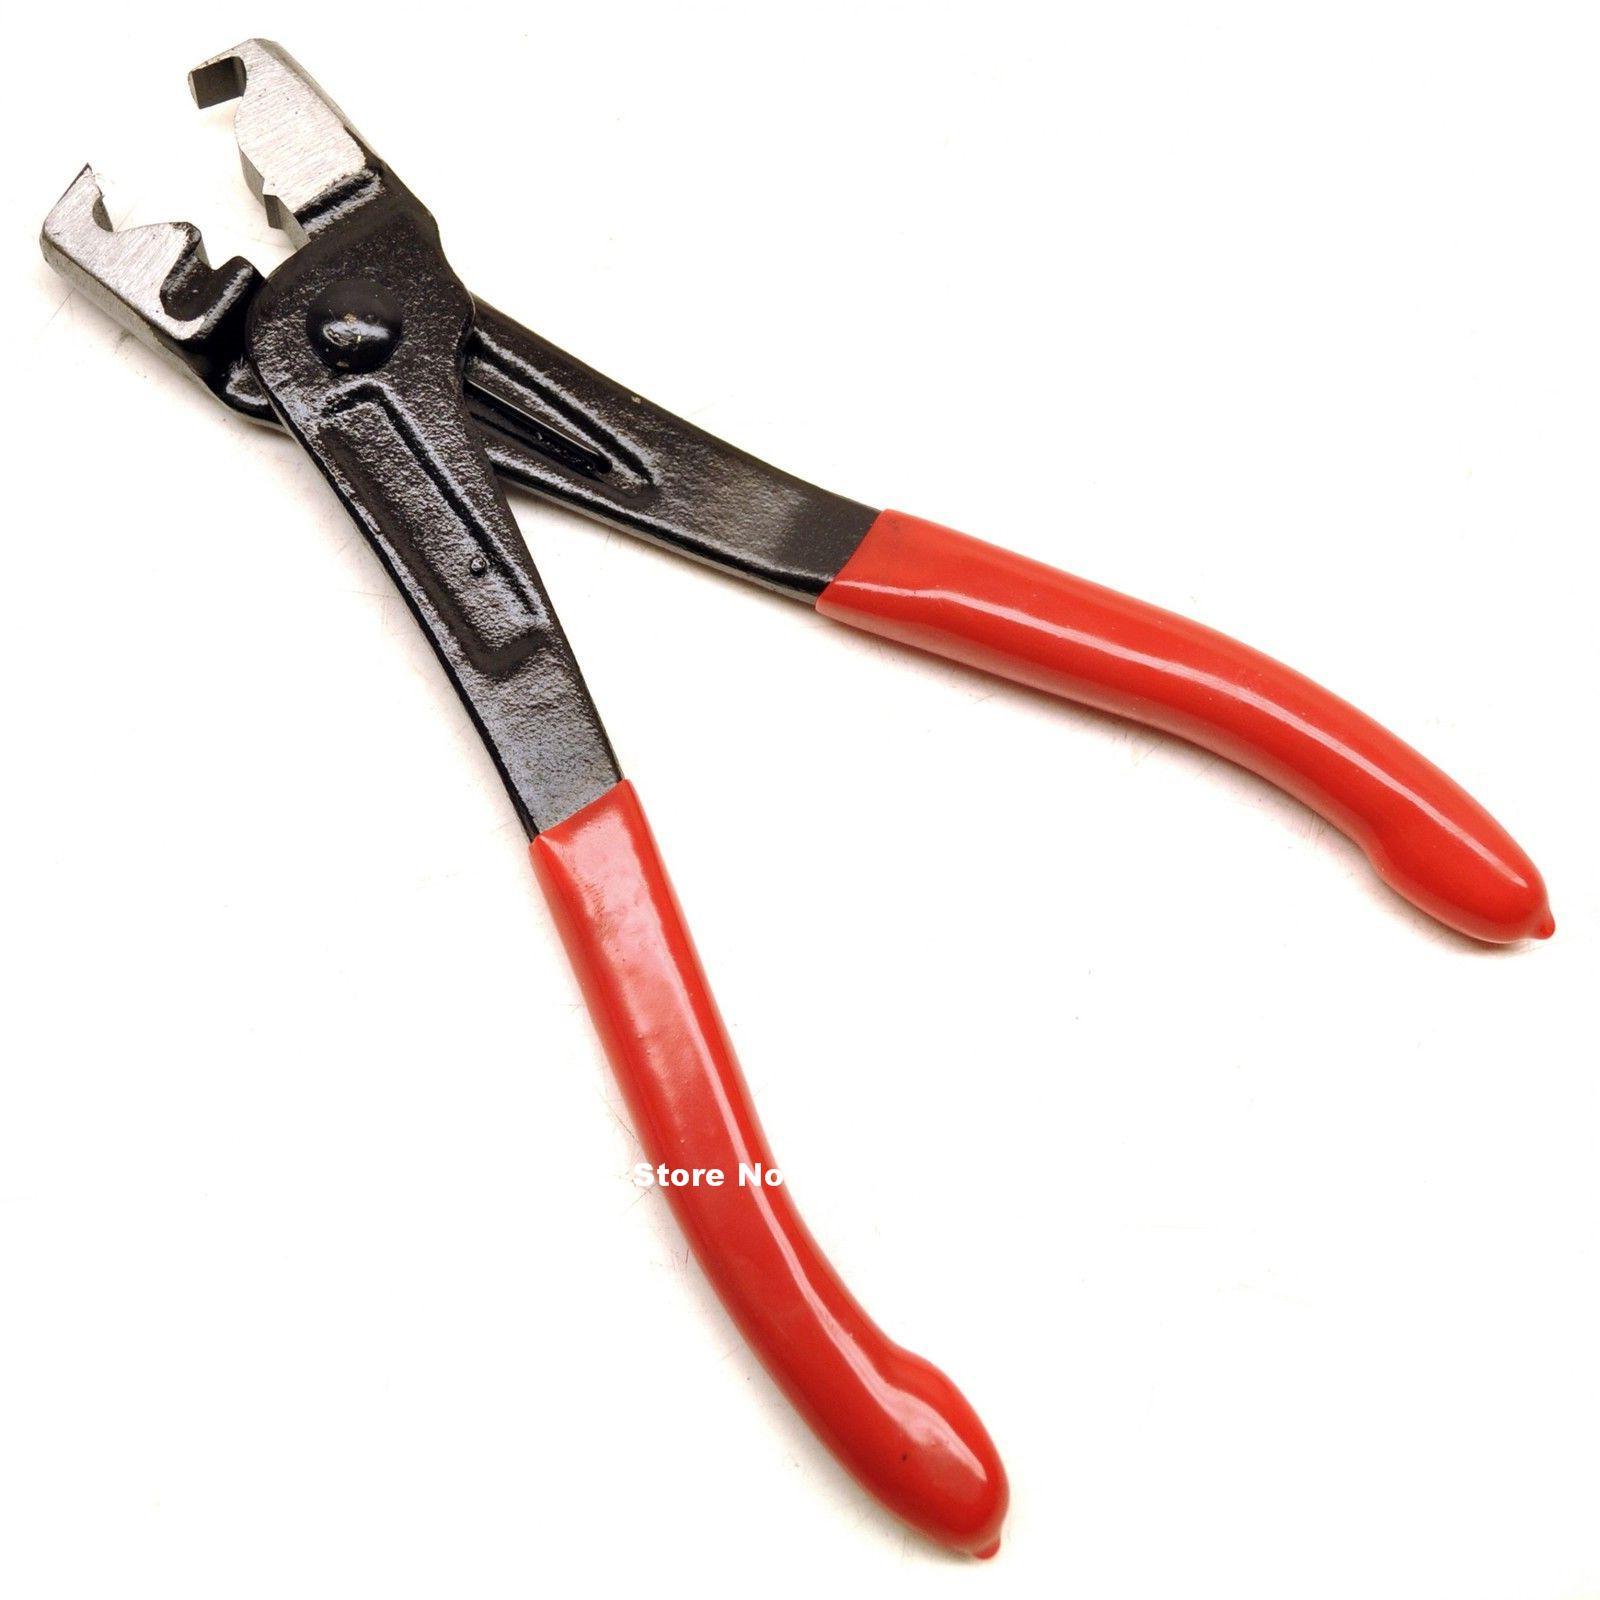 Universal Clic R Type Collars Hose Clip Pliers Clic Tool Auto Repair Garage Tools For VW